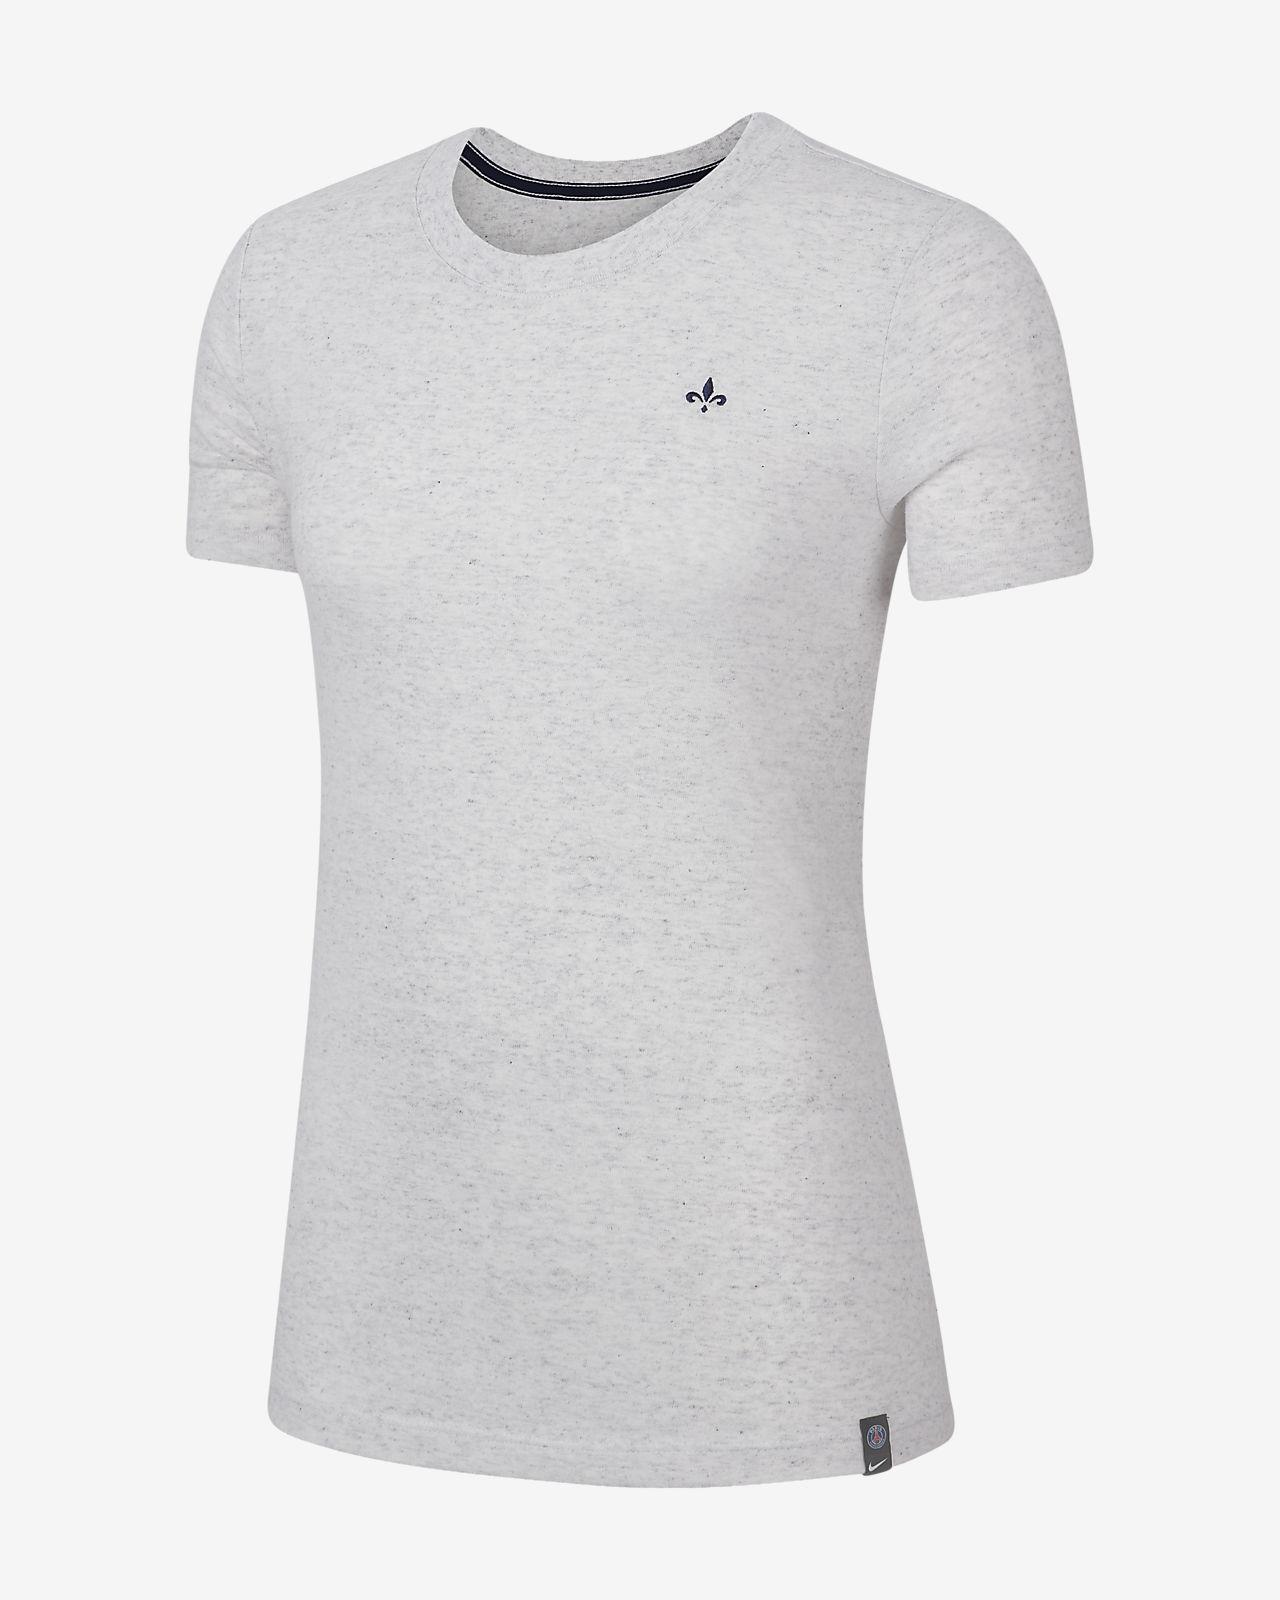 Paris Saint-Germain T-skjorte til dame